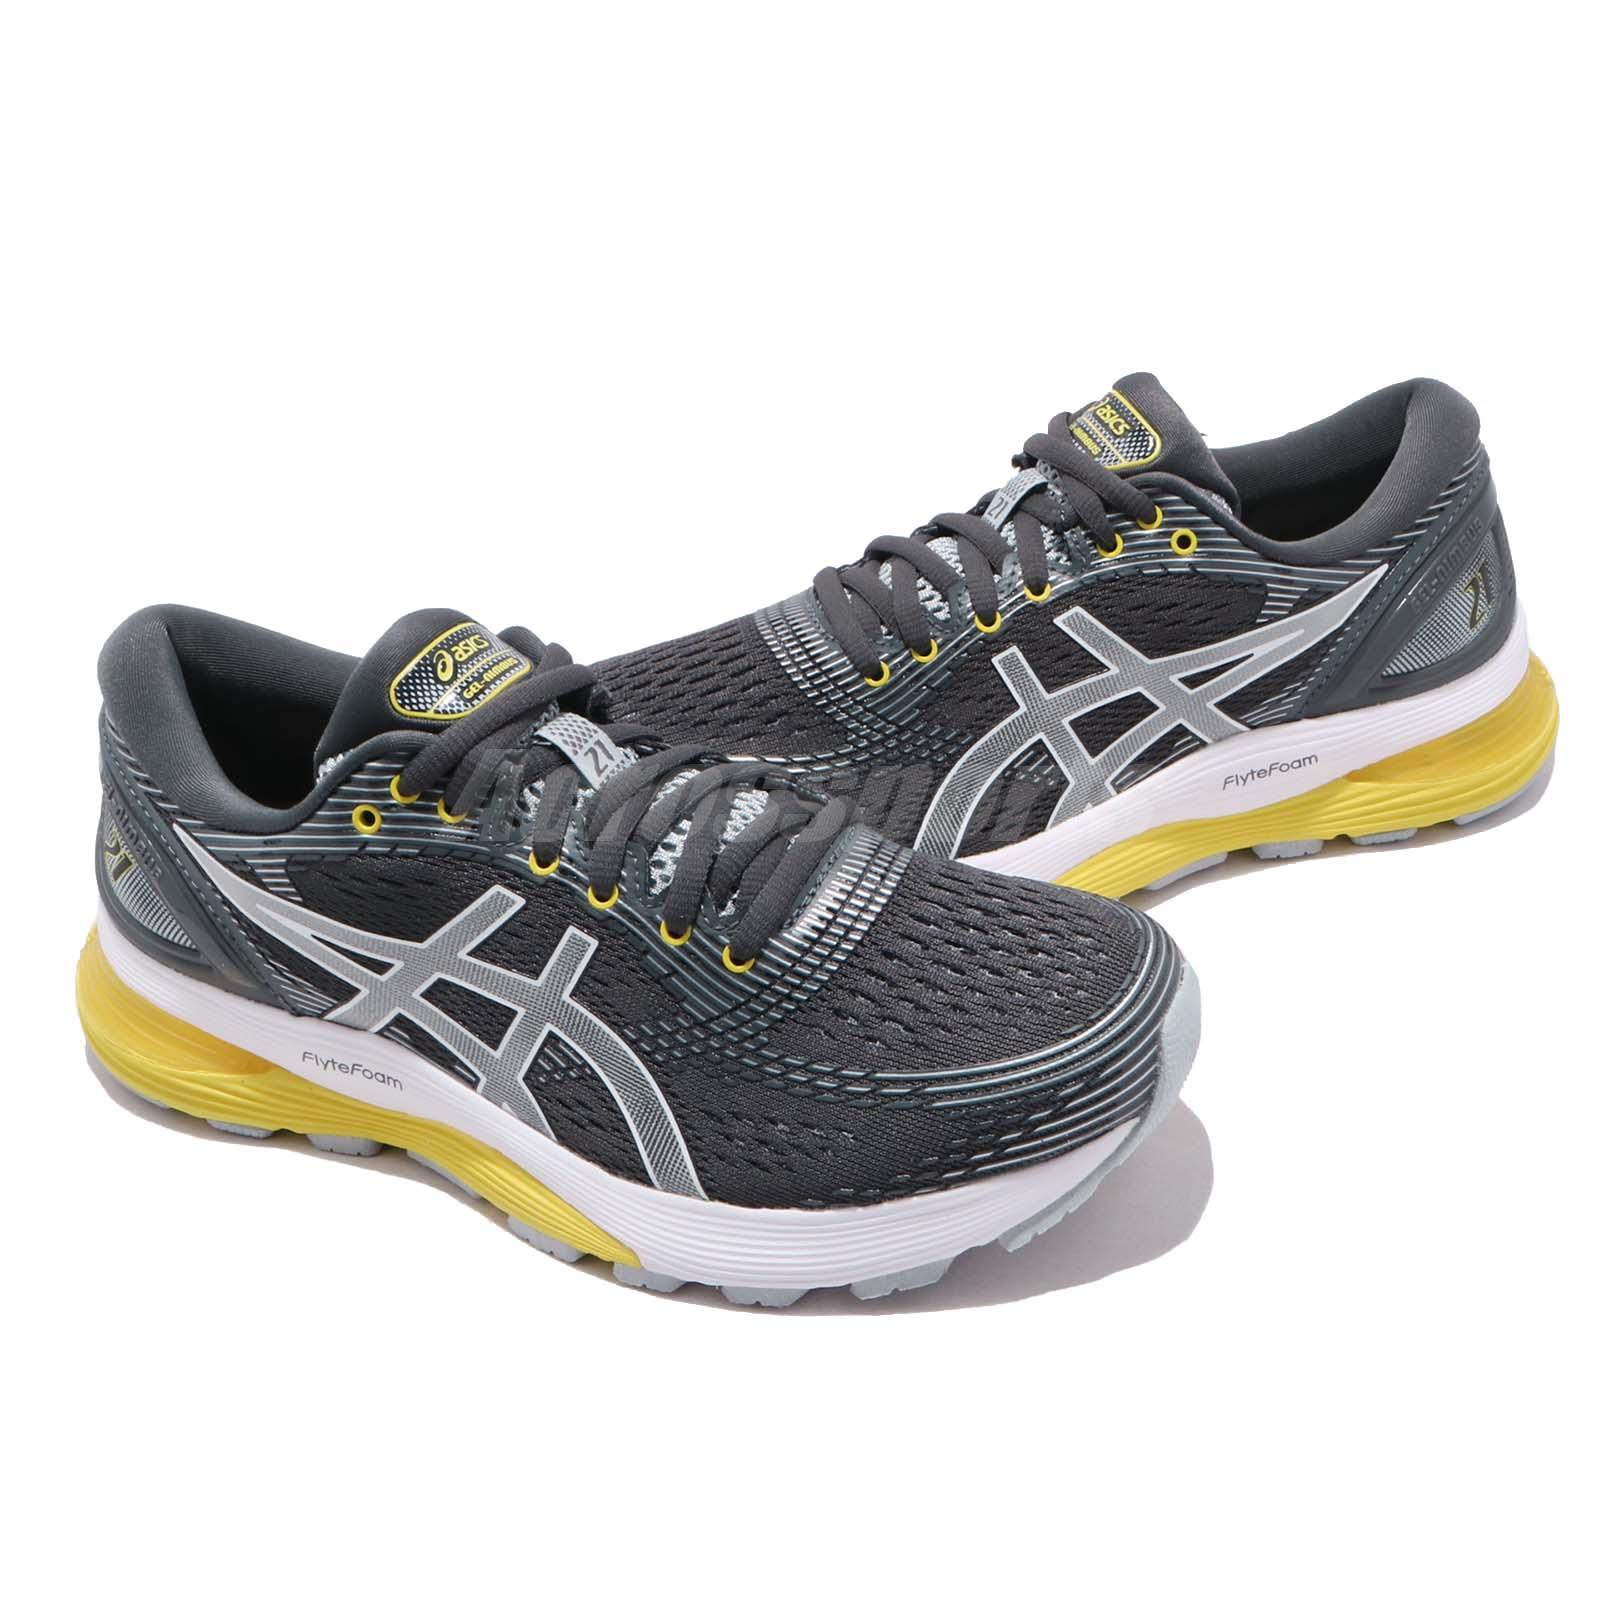 Asics Gel-Sonoma - Mens Shoes - Black/Royal Burgundy ... |Maroon And Yellow Asics Shoes